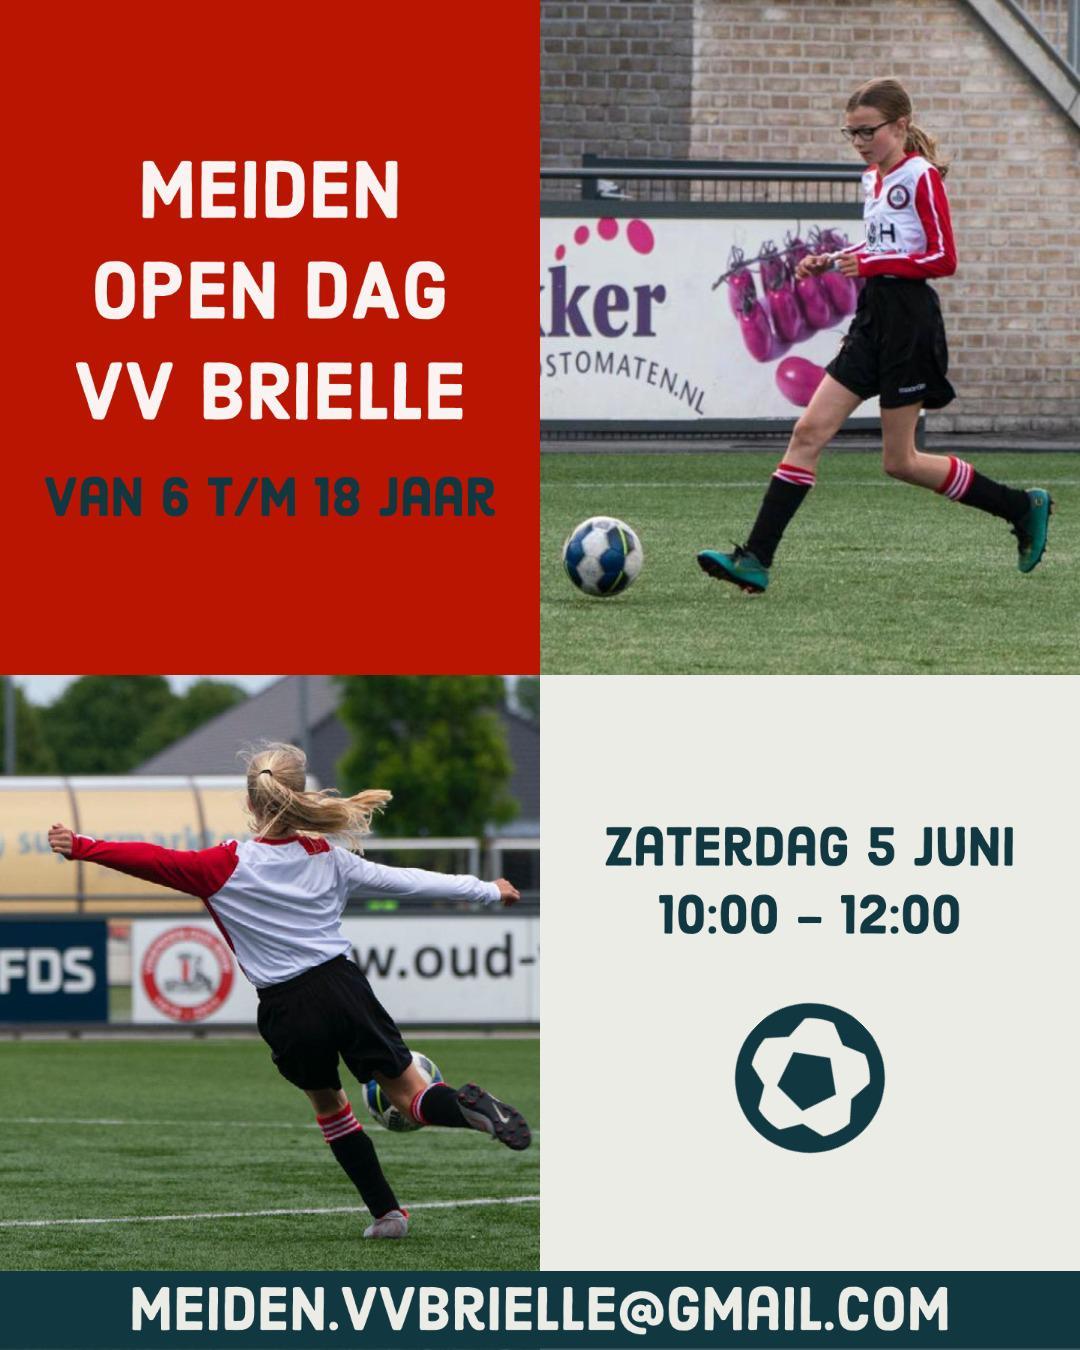 Meiden open dag VV Brielle